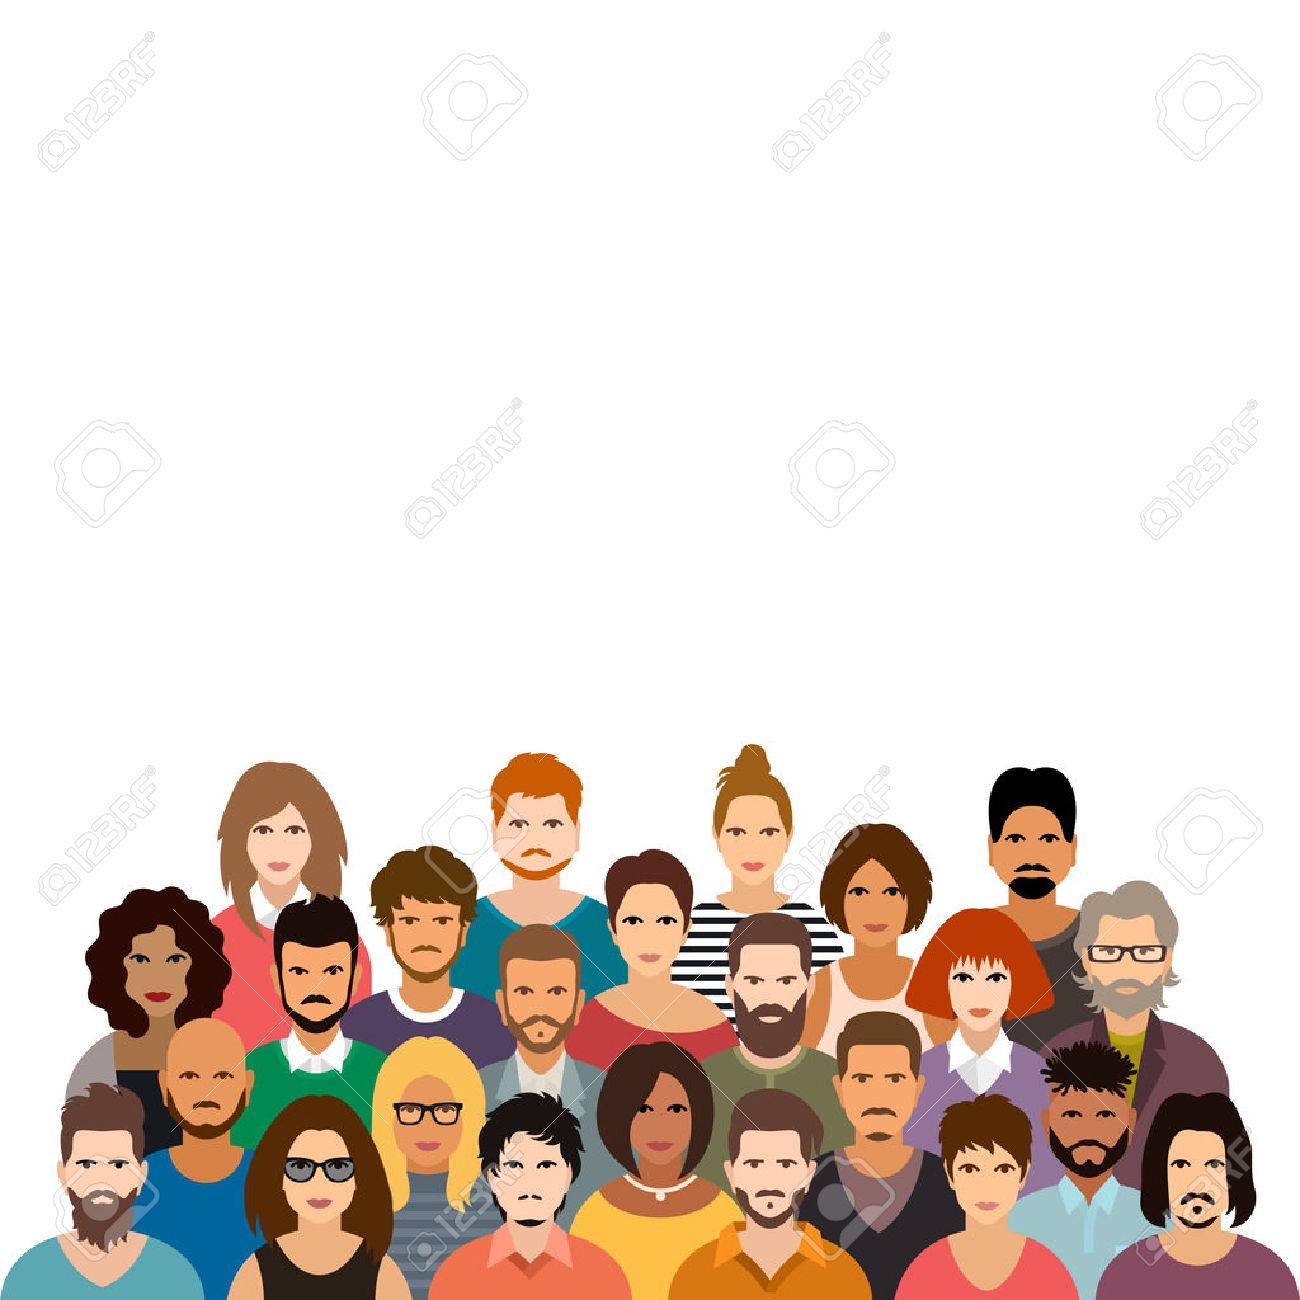 People crowd vector illustration - 55803151